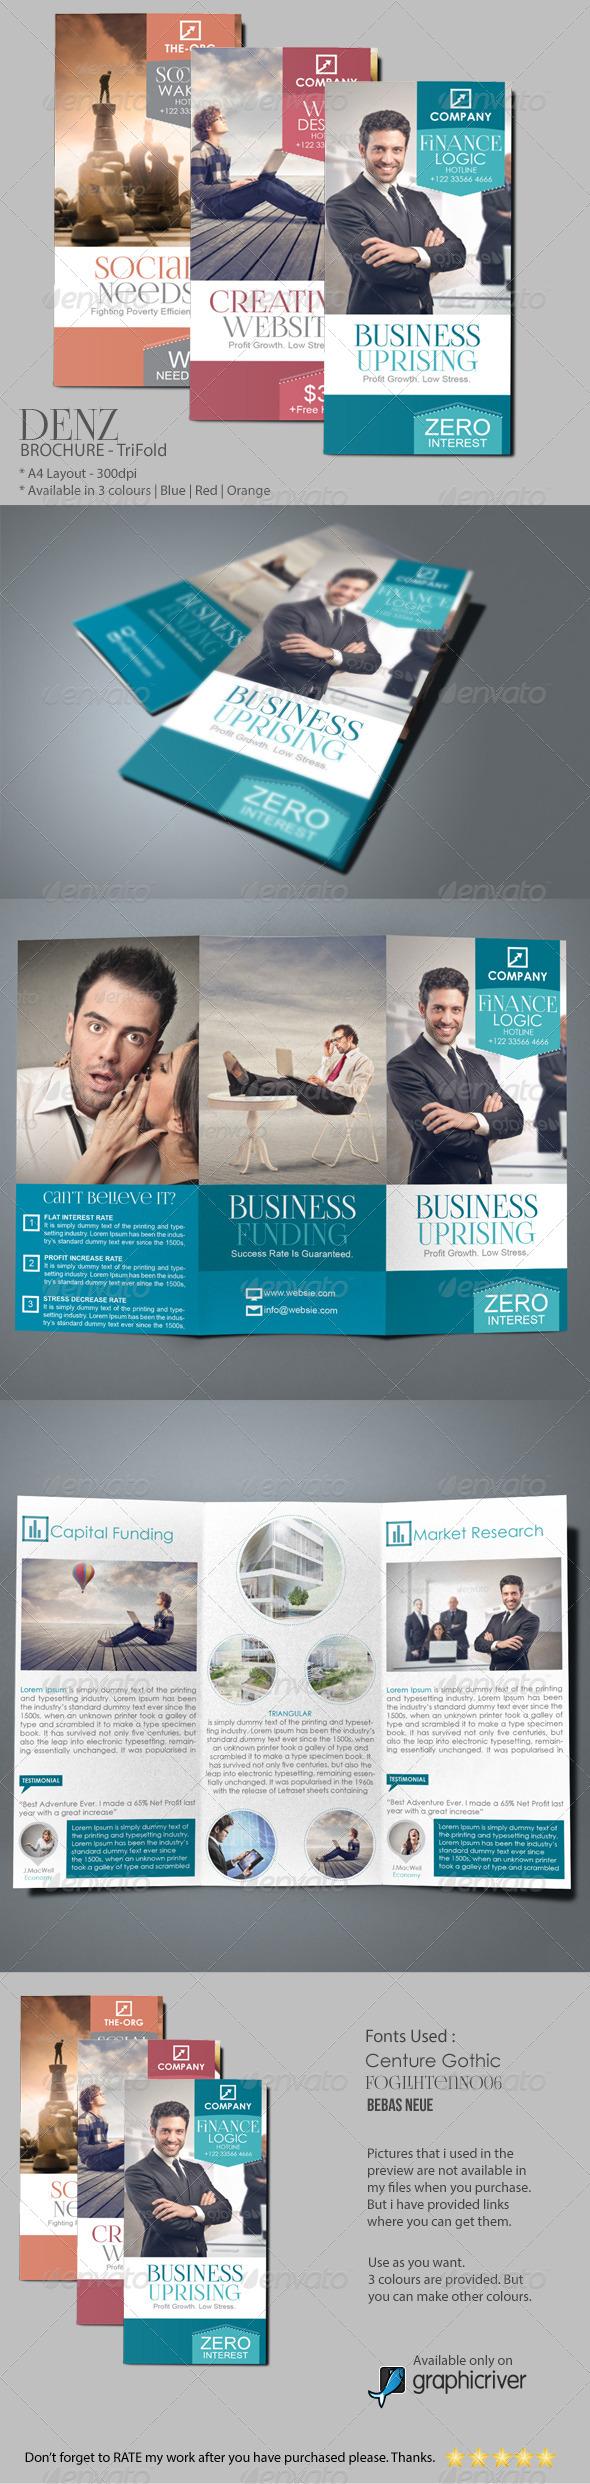 GraphicRiver DENZ Business Brochure 6421898